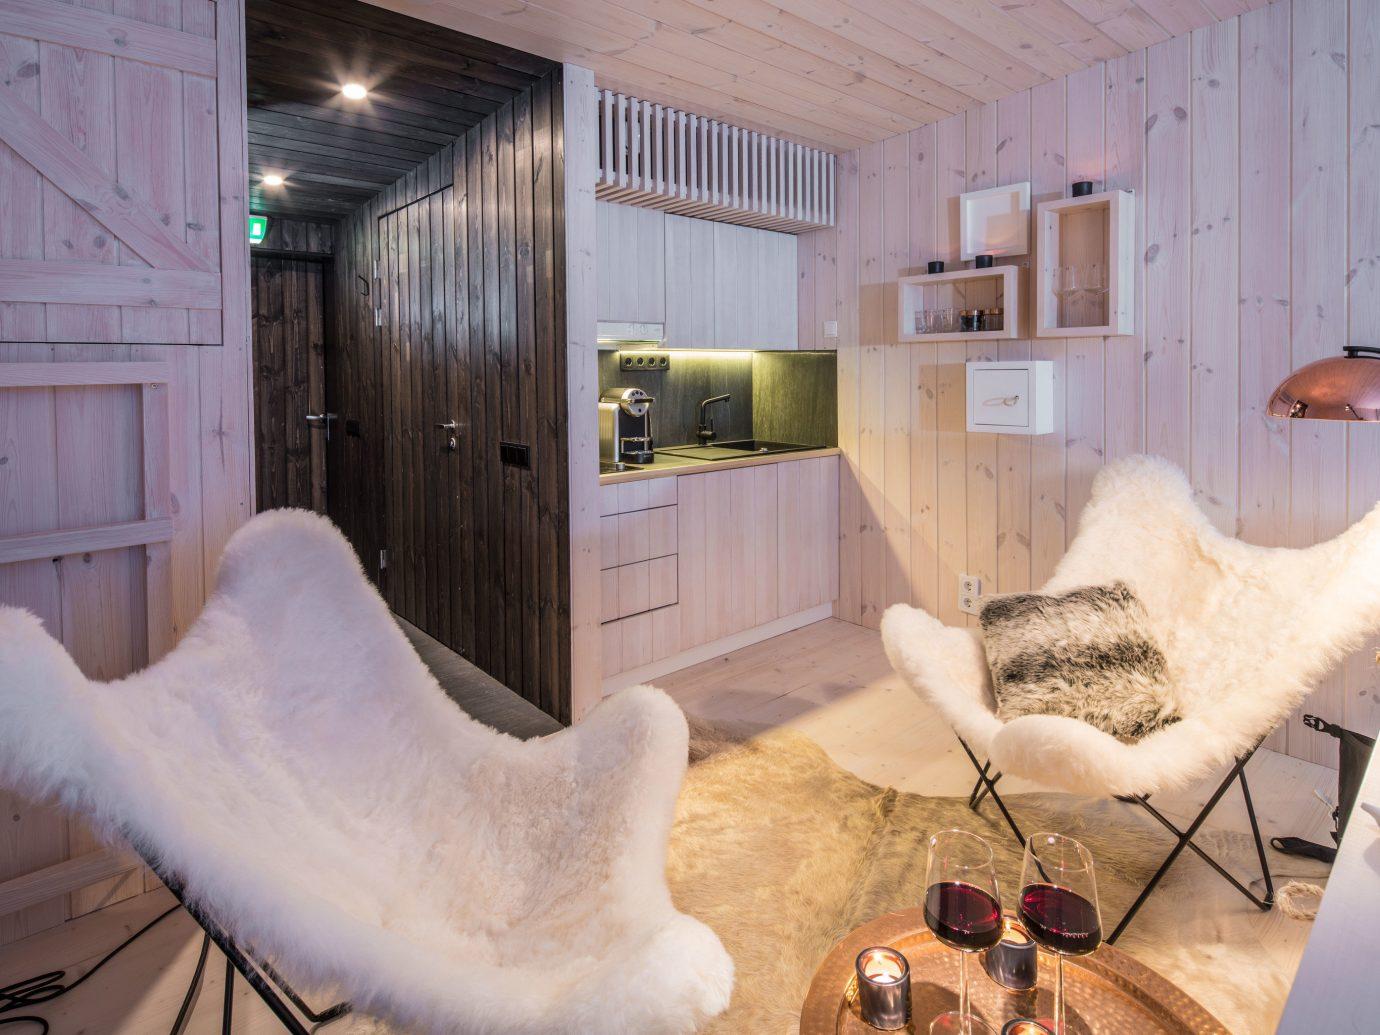 Finland Trip Ideas indoor room interior design home ceiling furniture floor flooring interior designer loft Bedroom house